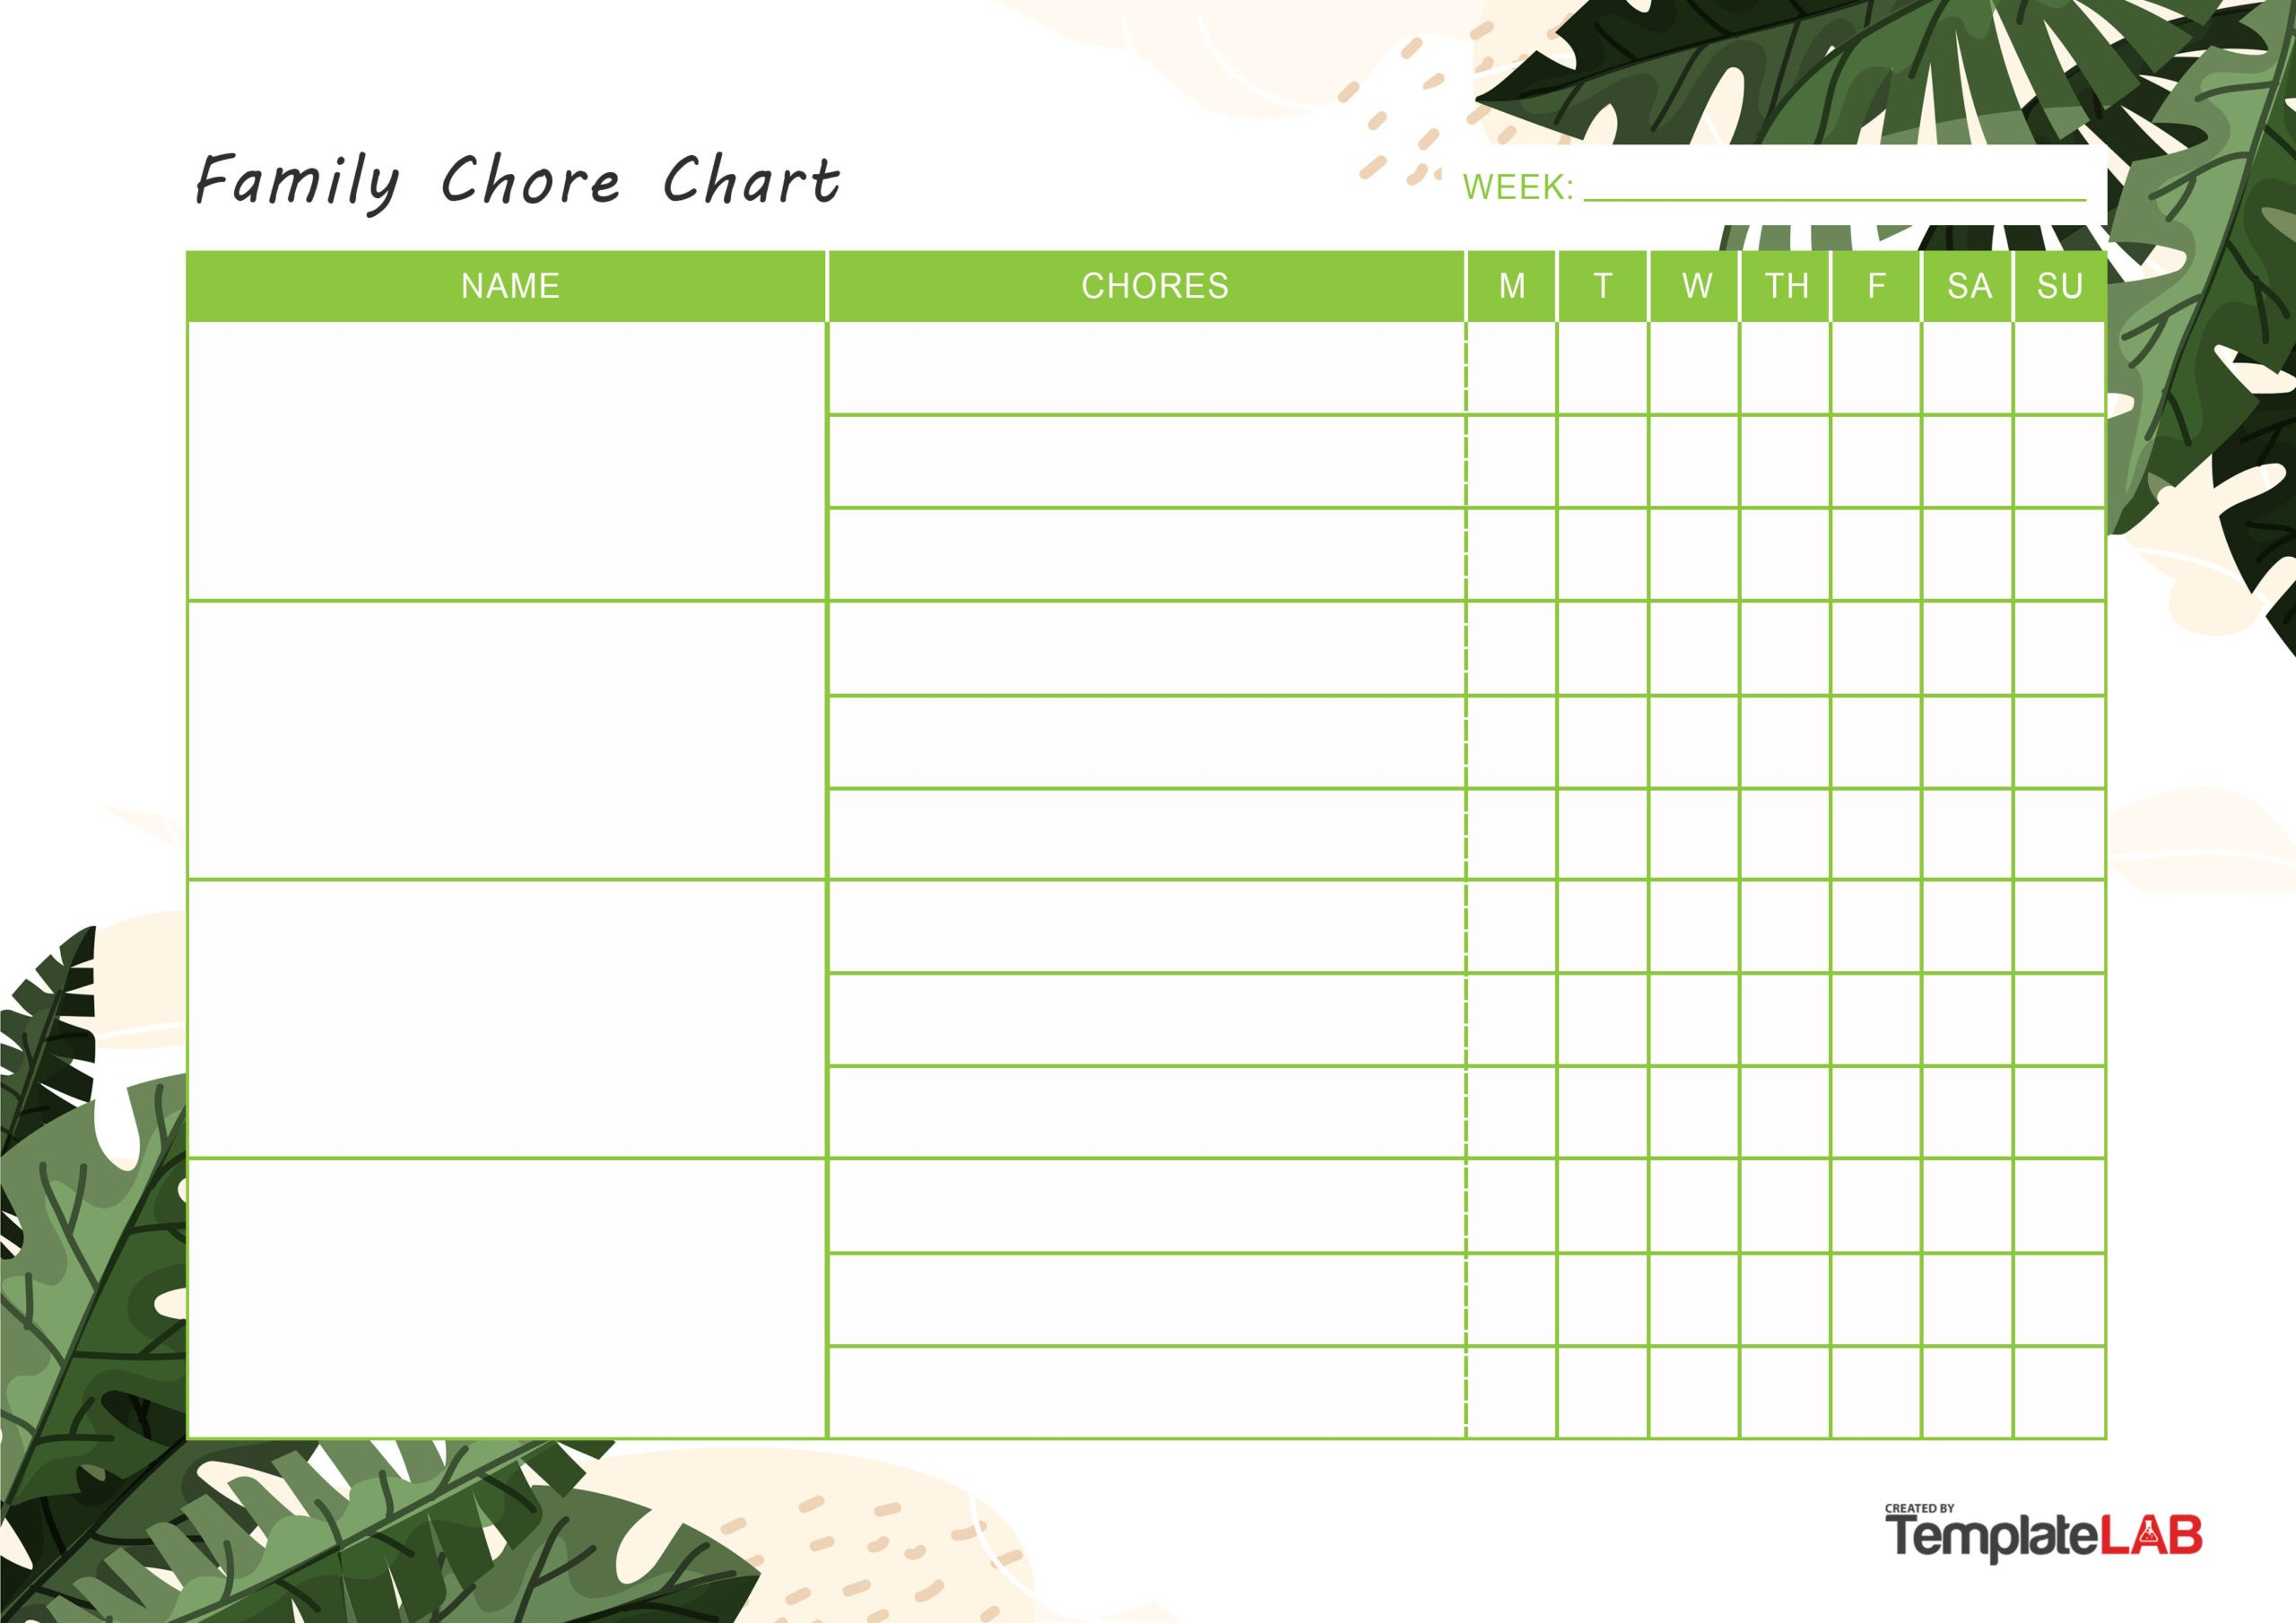 Free Family Chore Chart v2 - TemplateLab.com